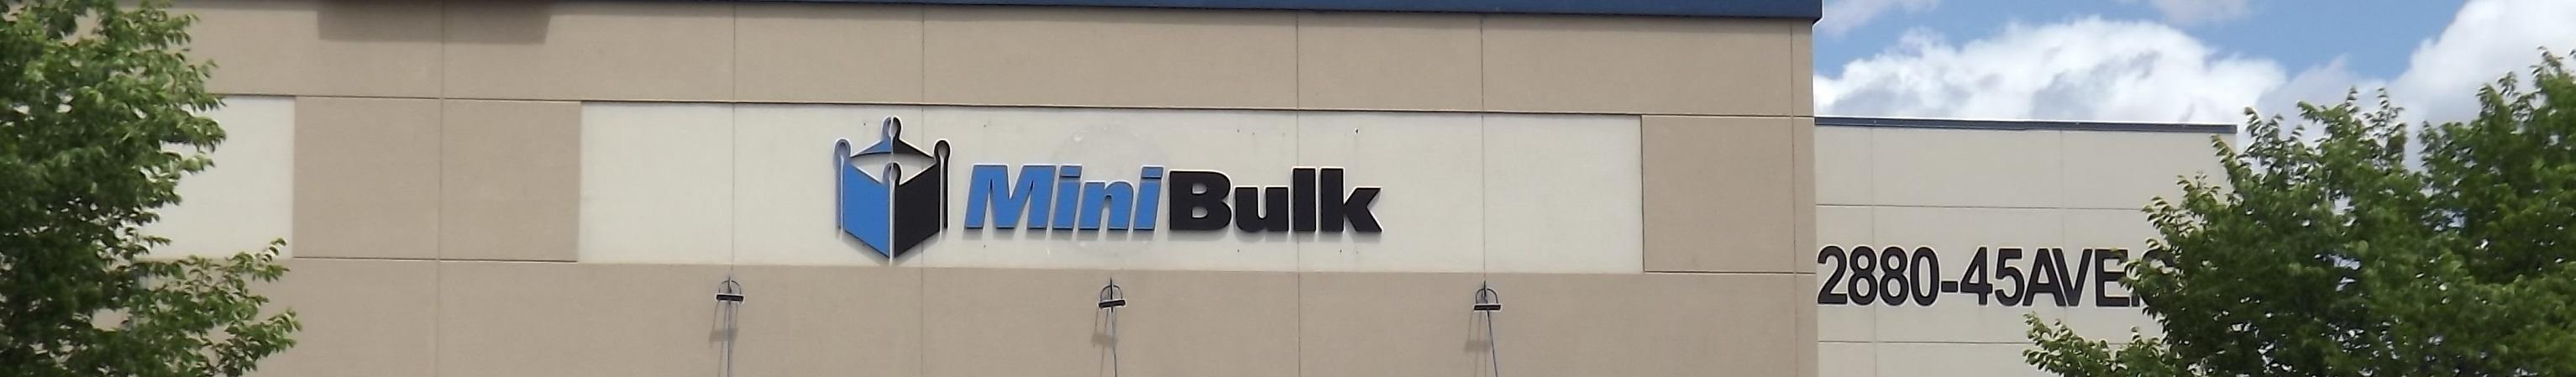 MiniBulk-Calgary-HQ-Alberta-Why-Page.jpg